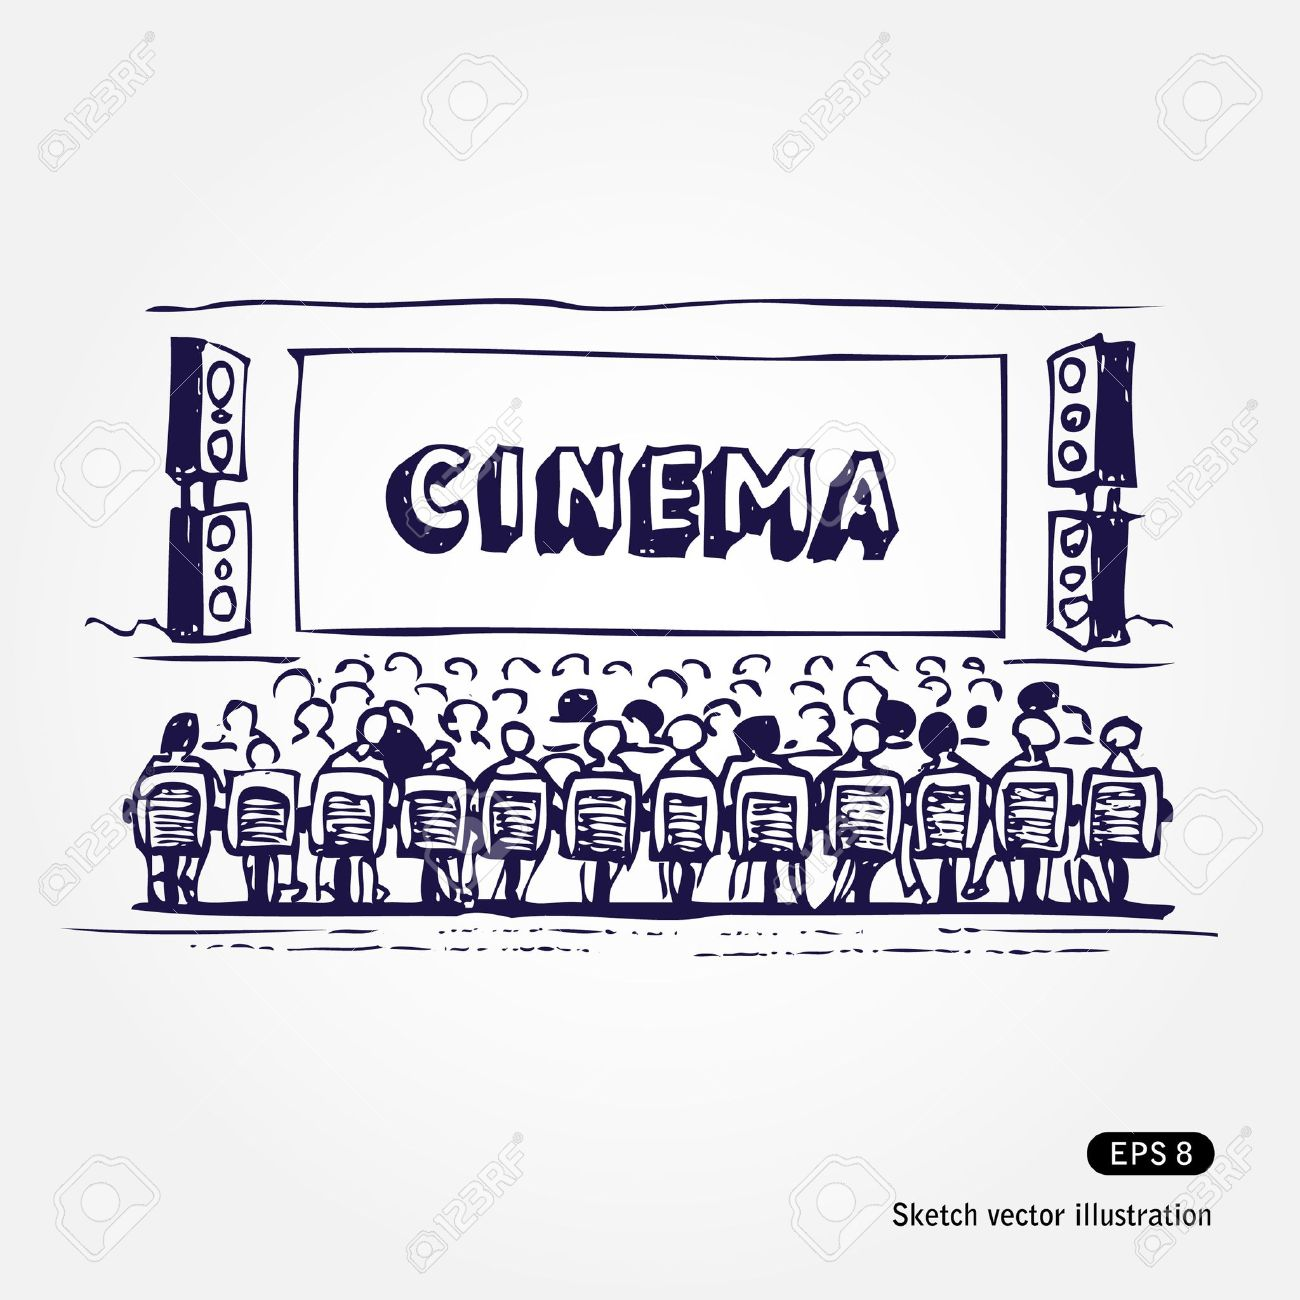 Hand drawn illustration of cinema isolated on white background - 13727661